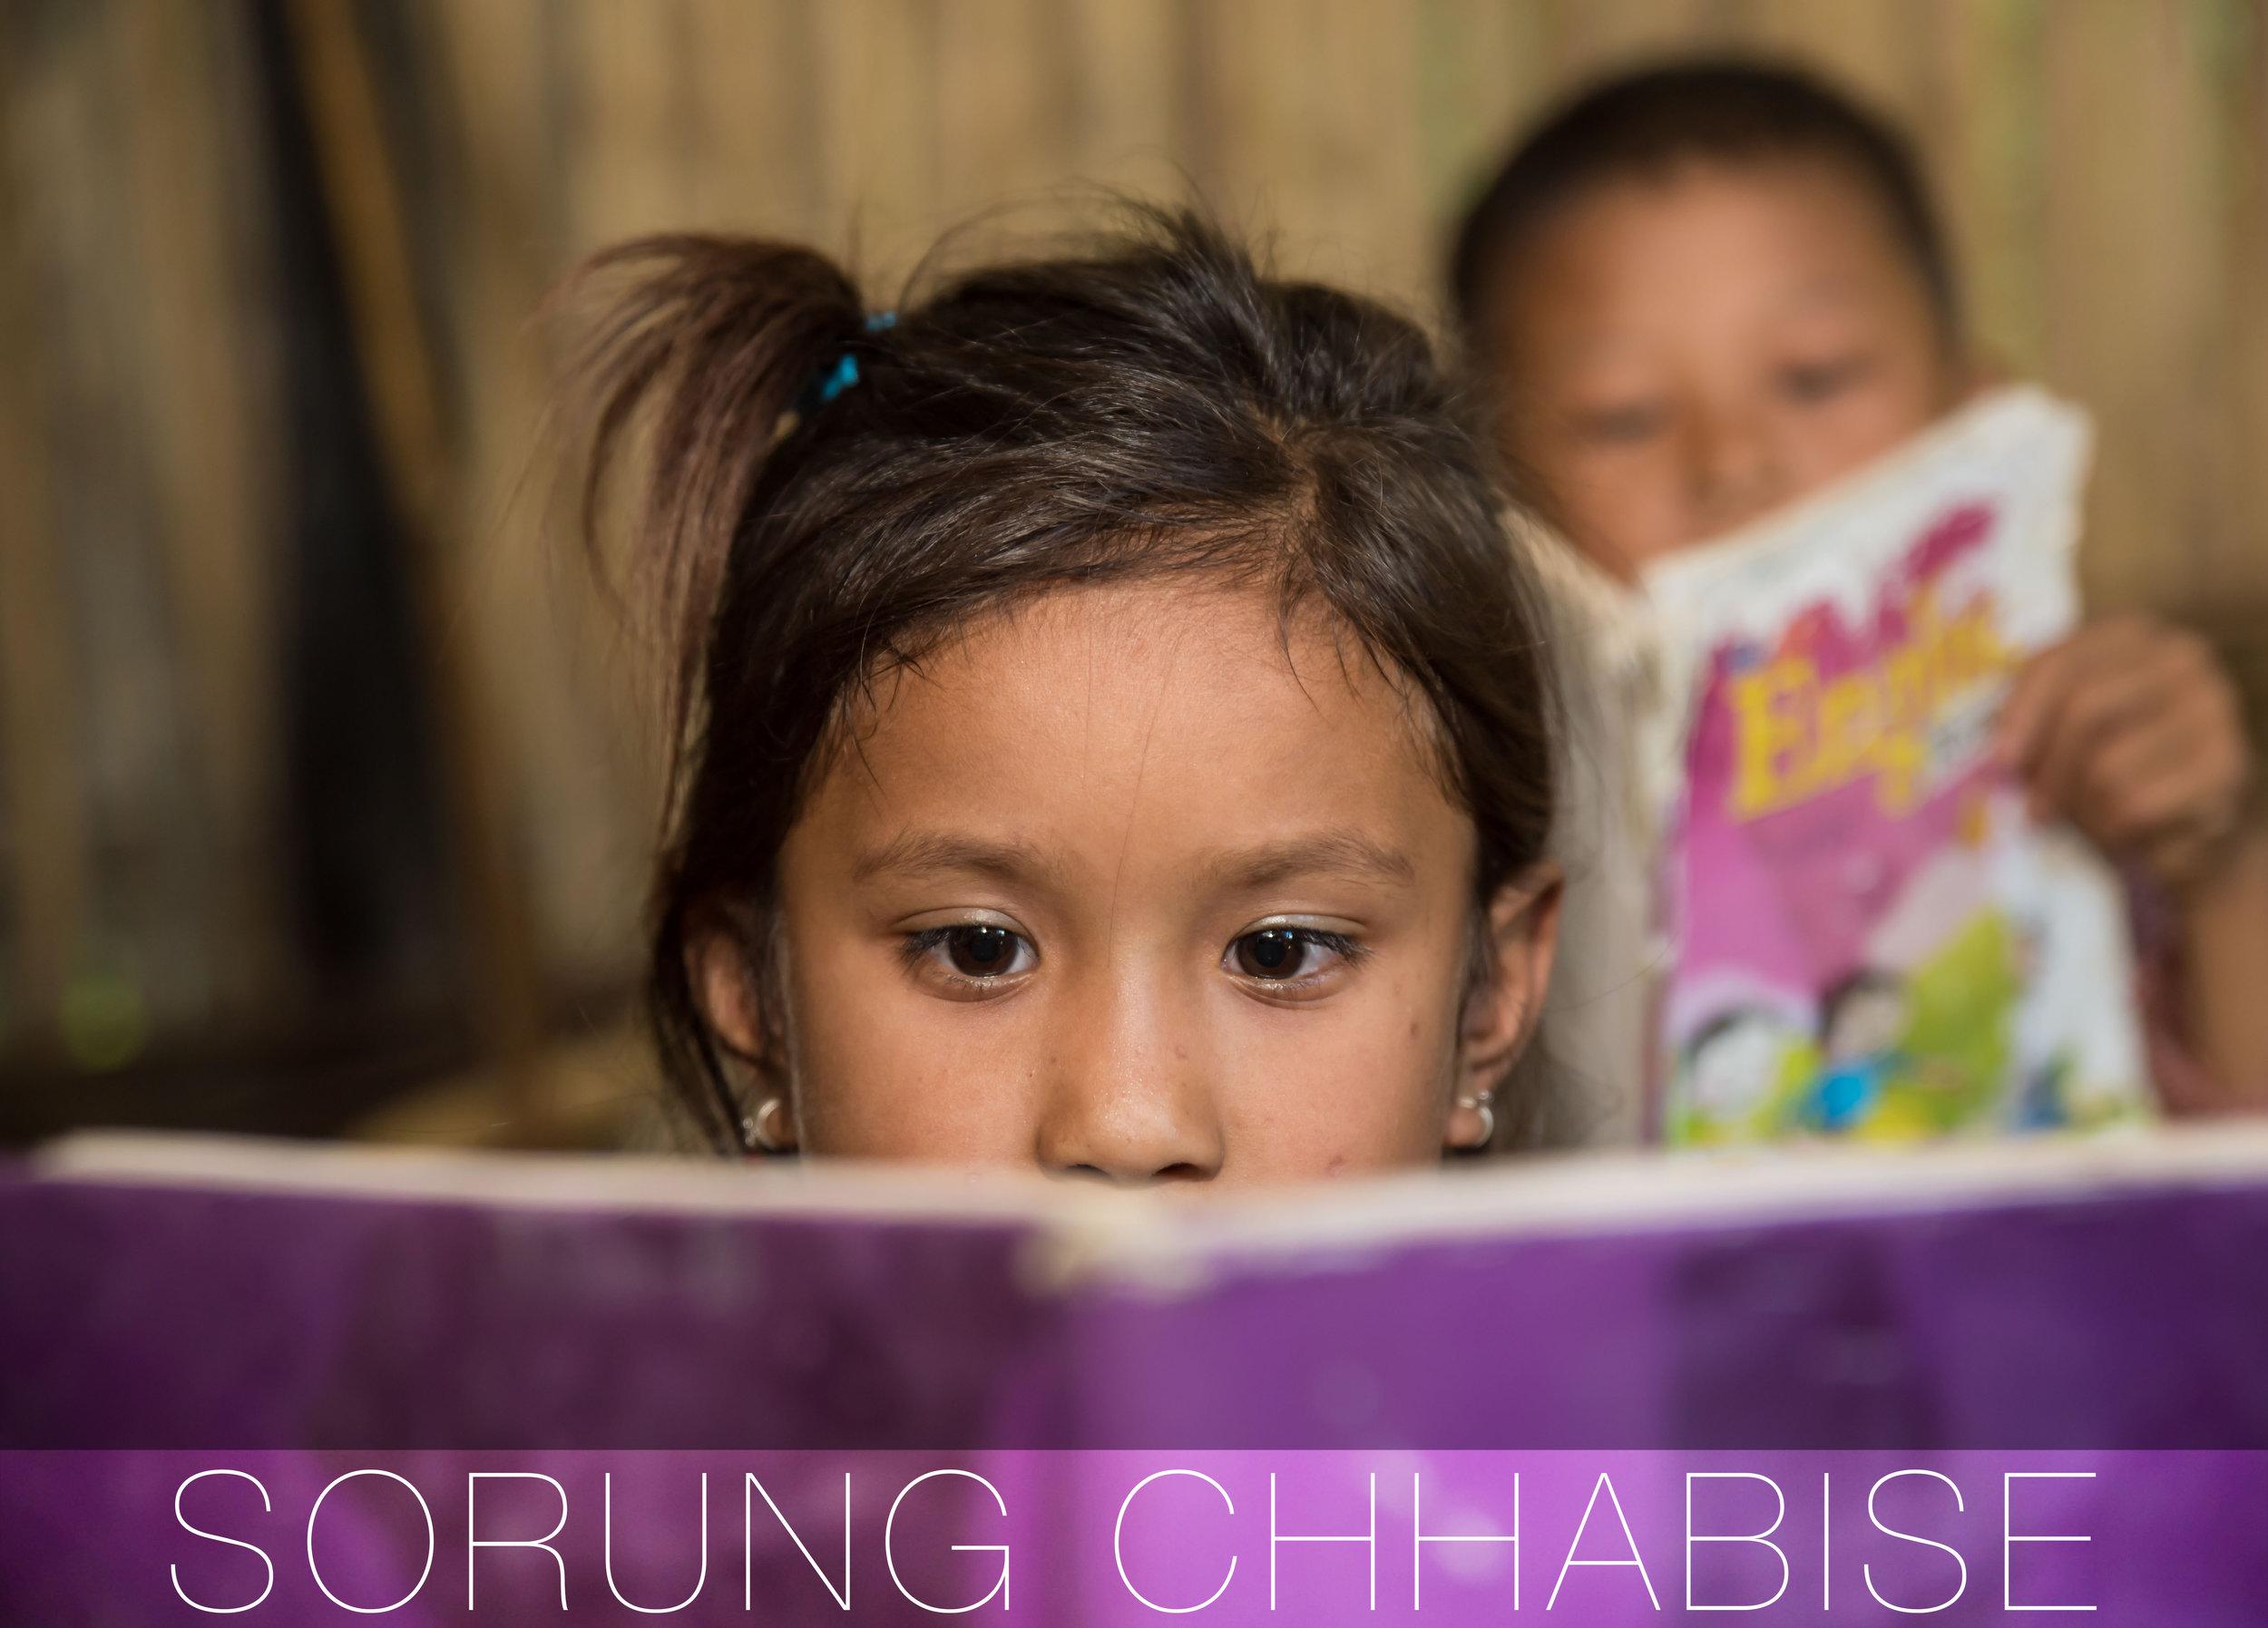 THISWORLDEXISTS Sorung Chhabise Nepal volunteer education